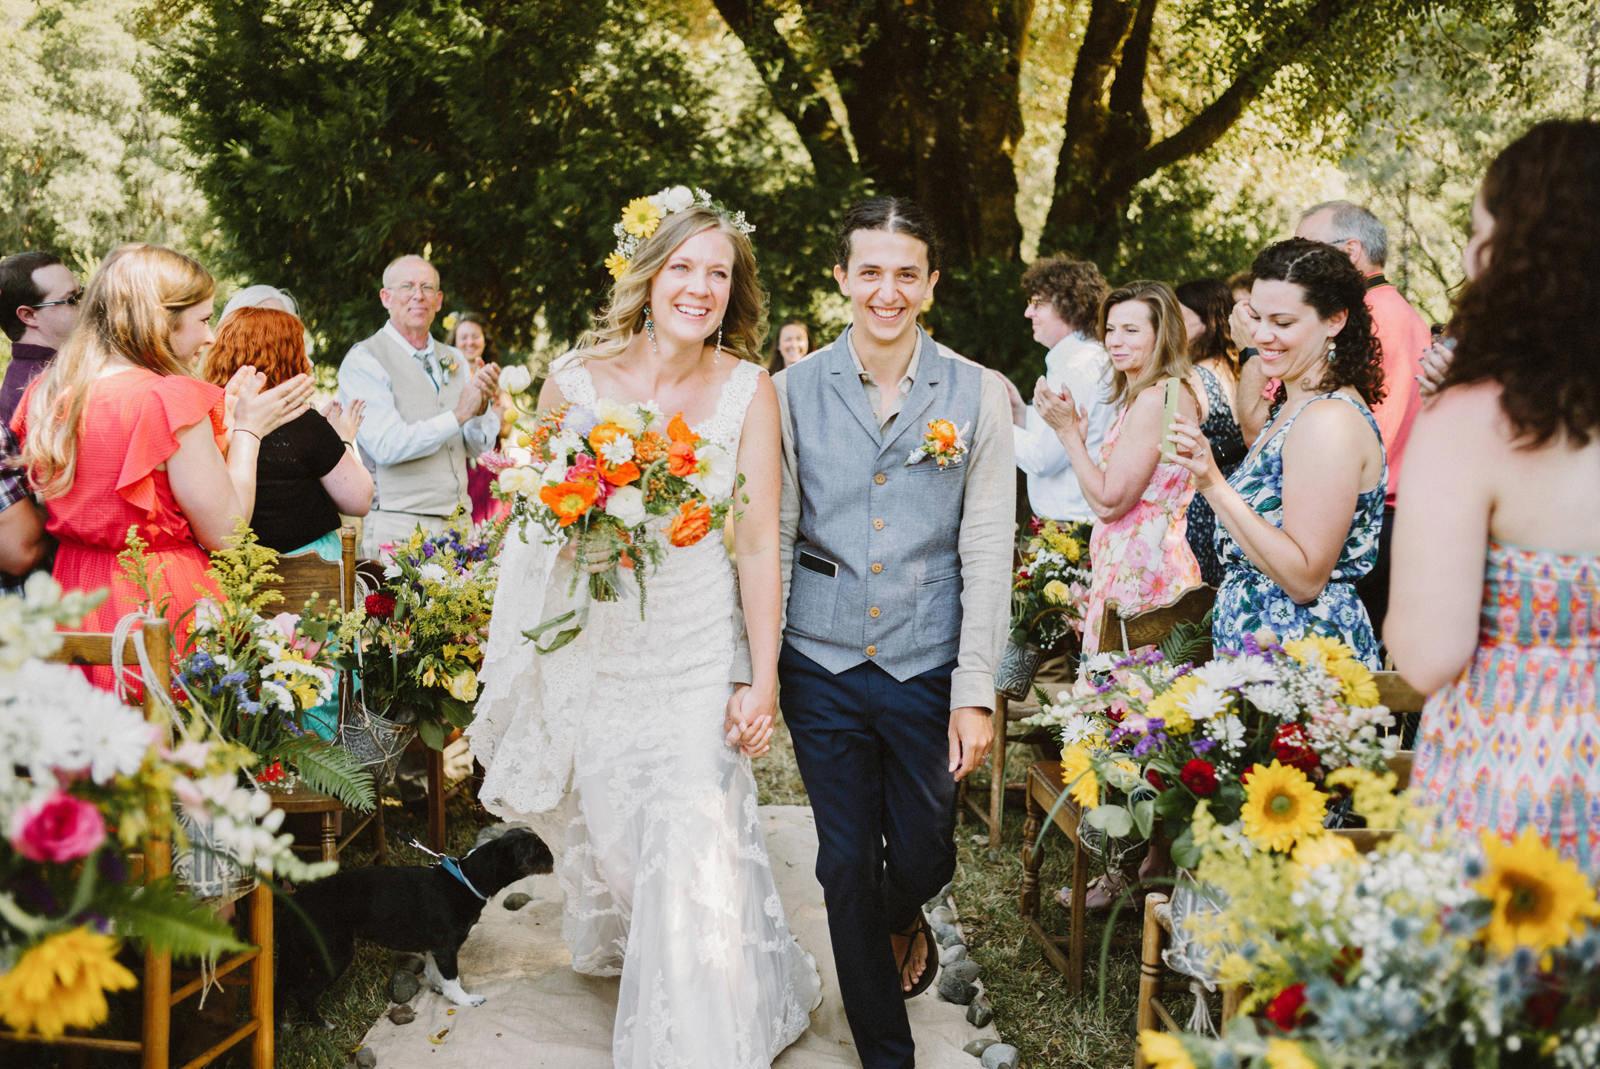 rivers-bend-retreat-wedding-038 RIVER'S BEND RETREAT WEDDING